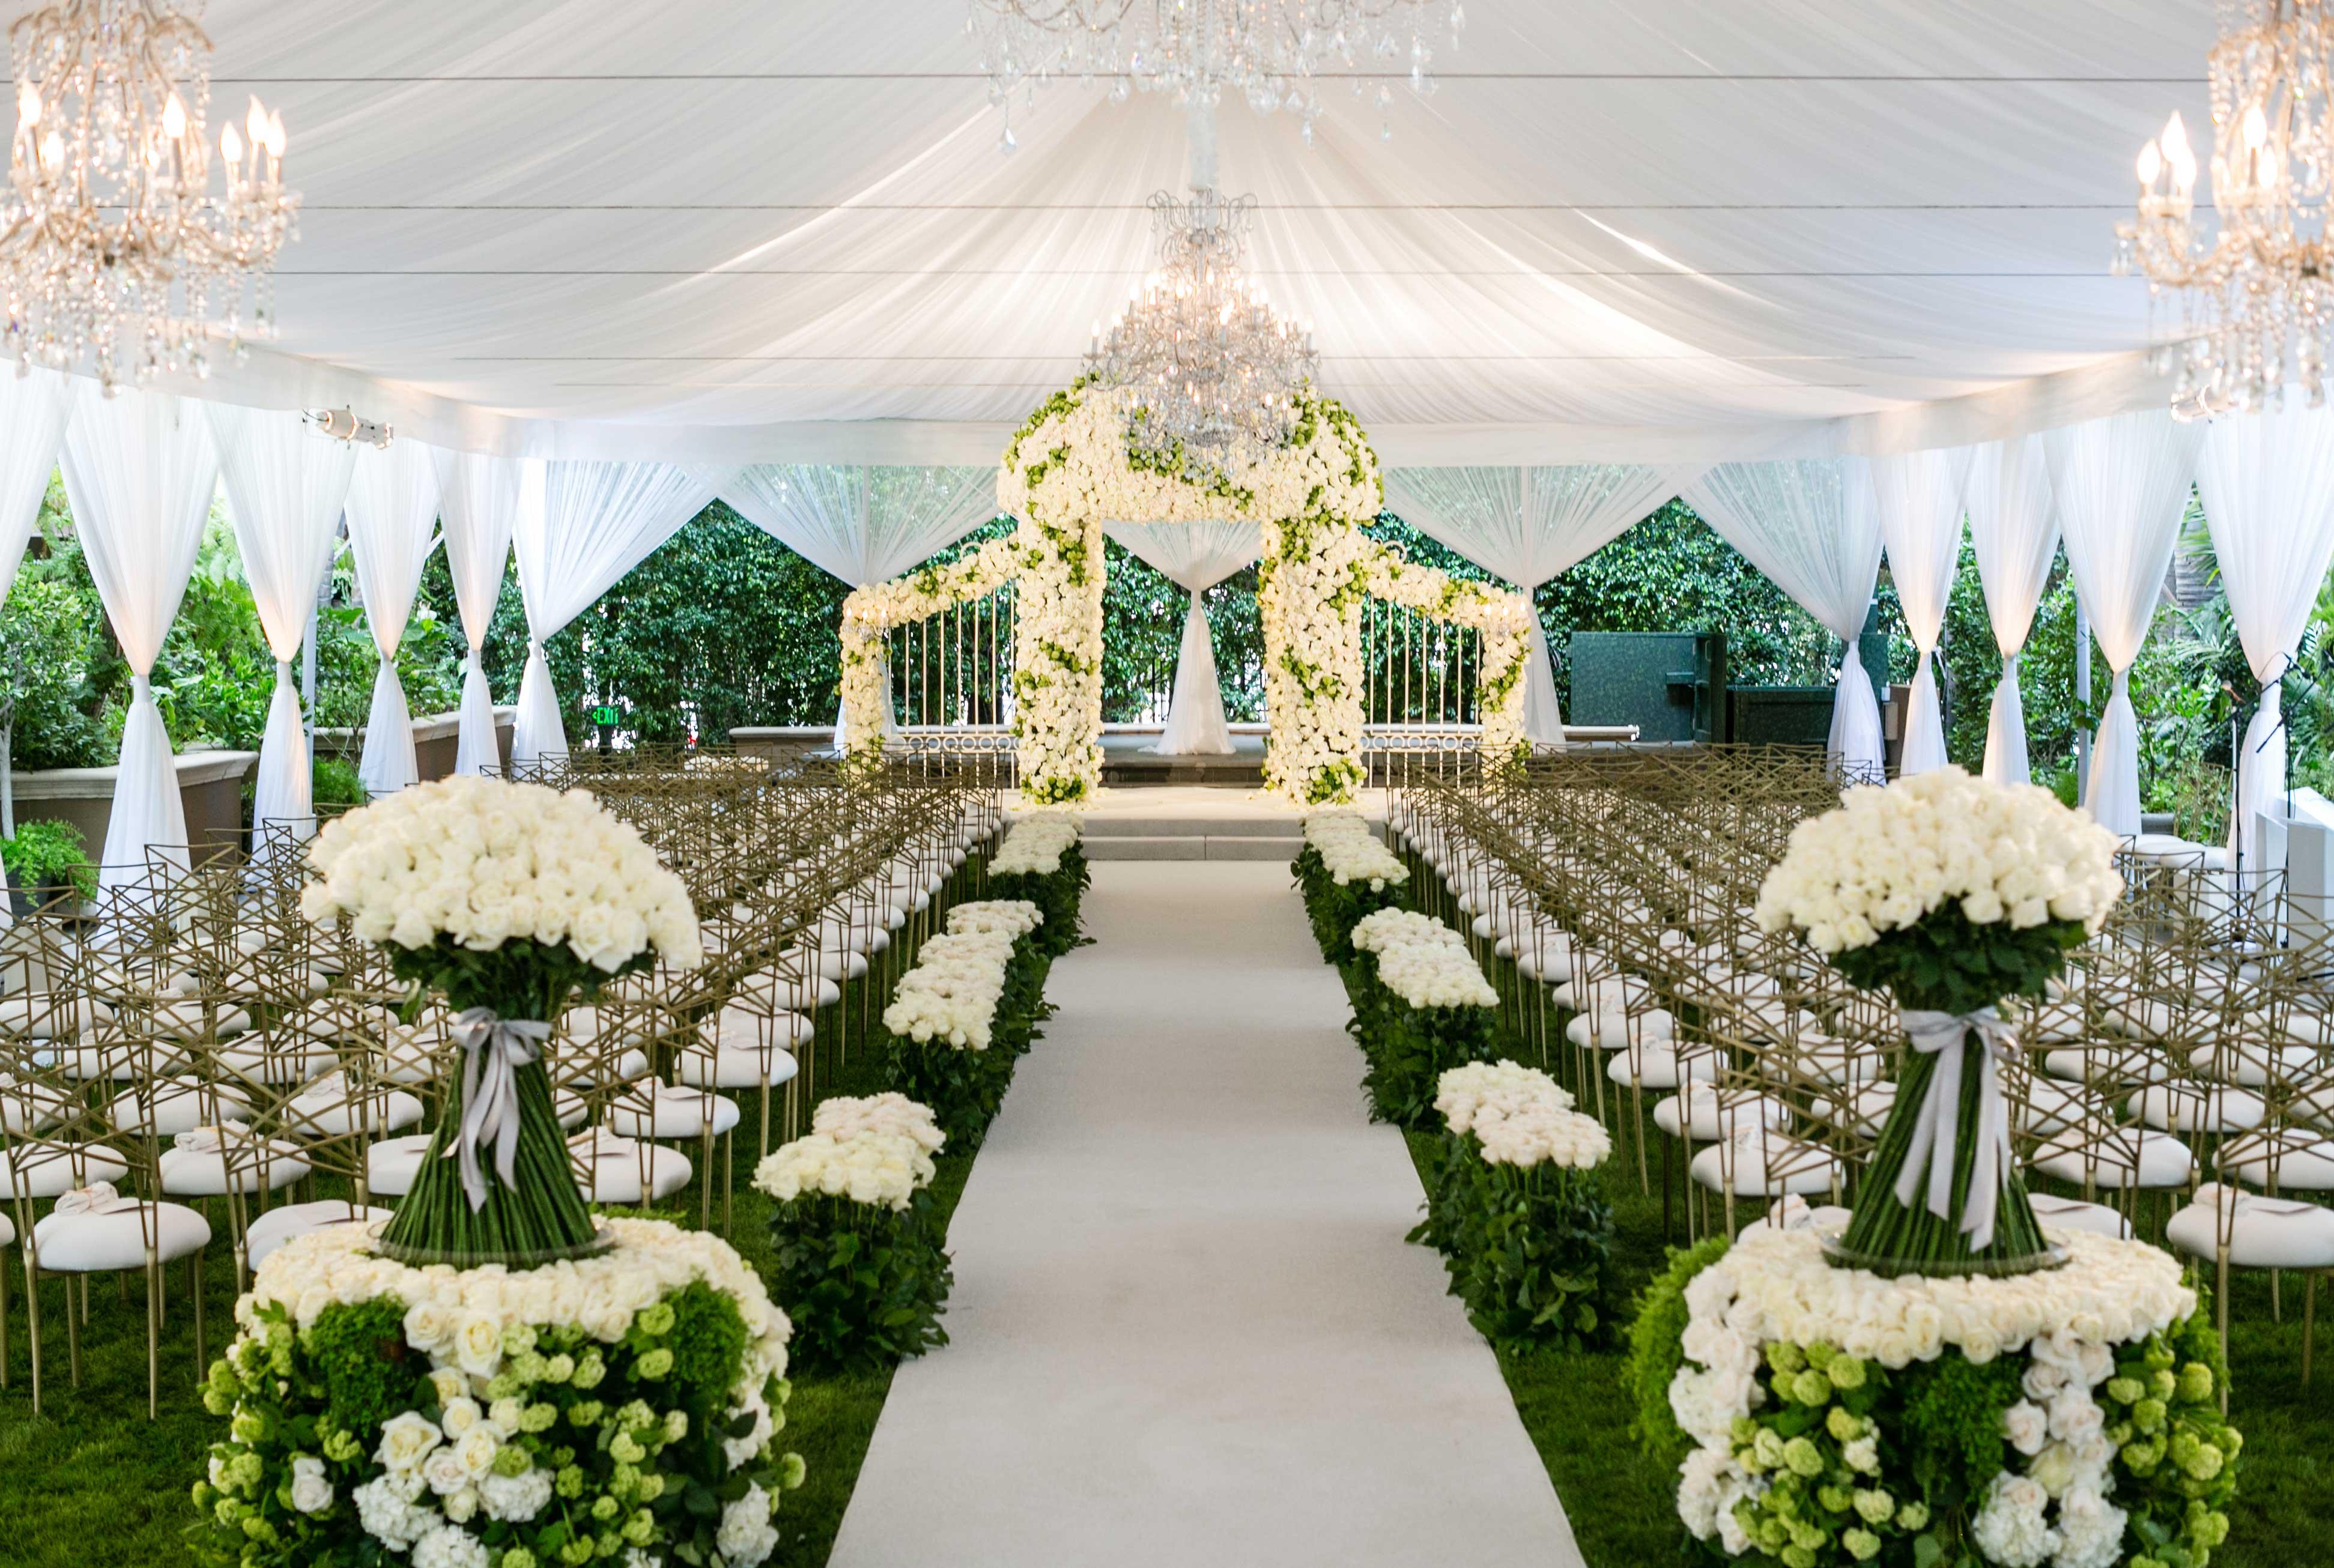 Wedding Ceremony Ideas: 16 Amazing Chuppahs